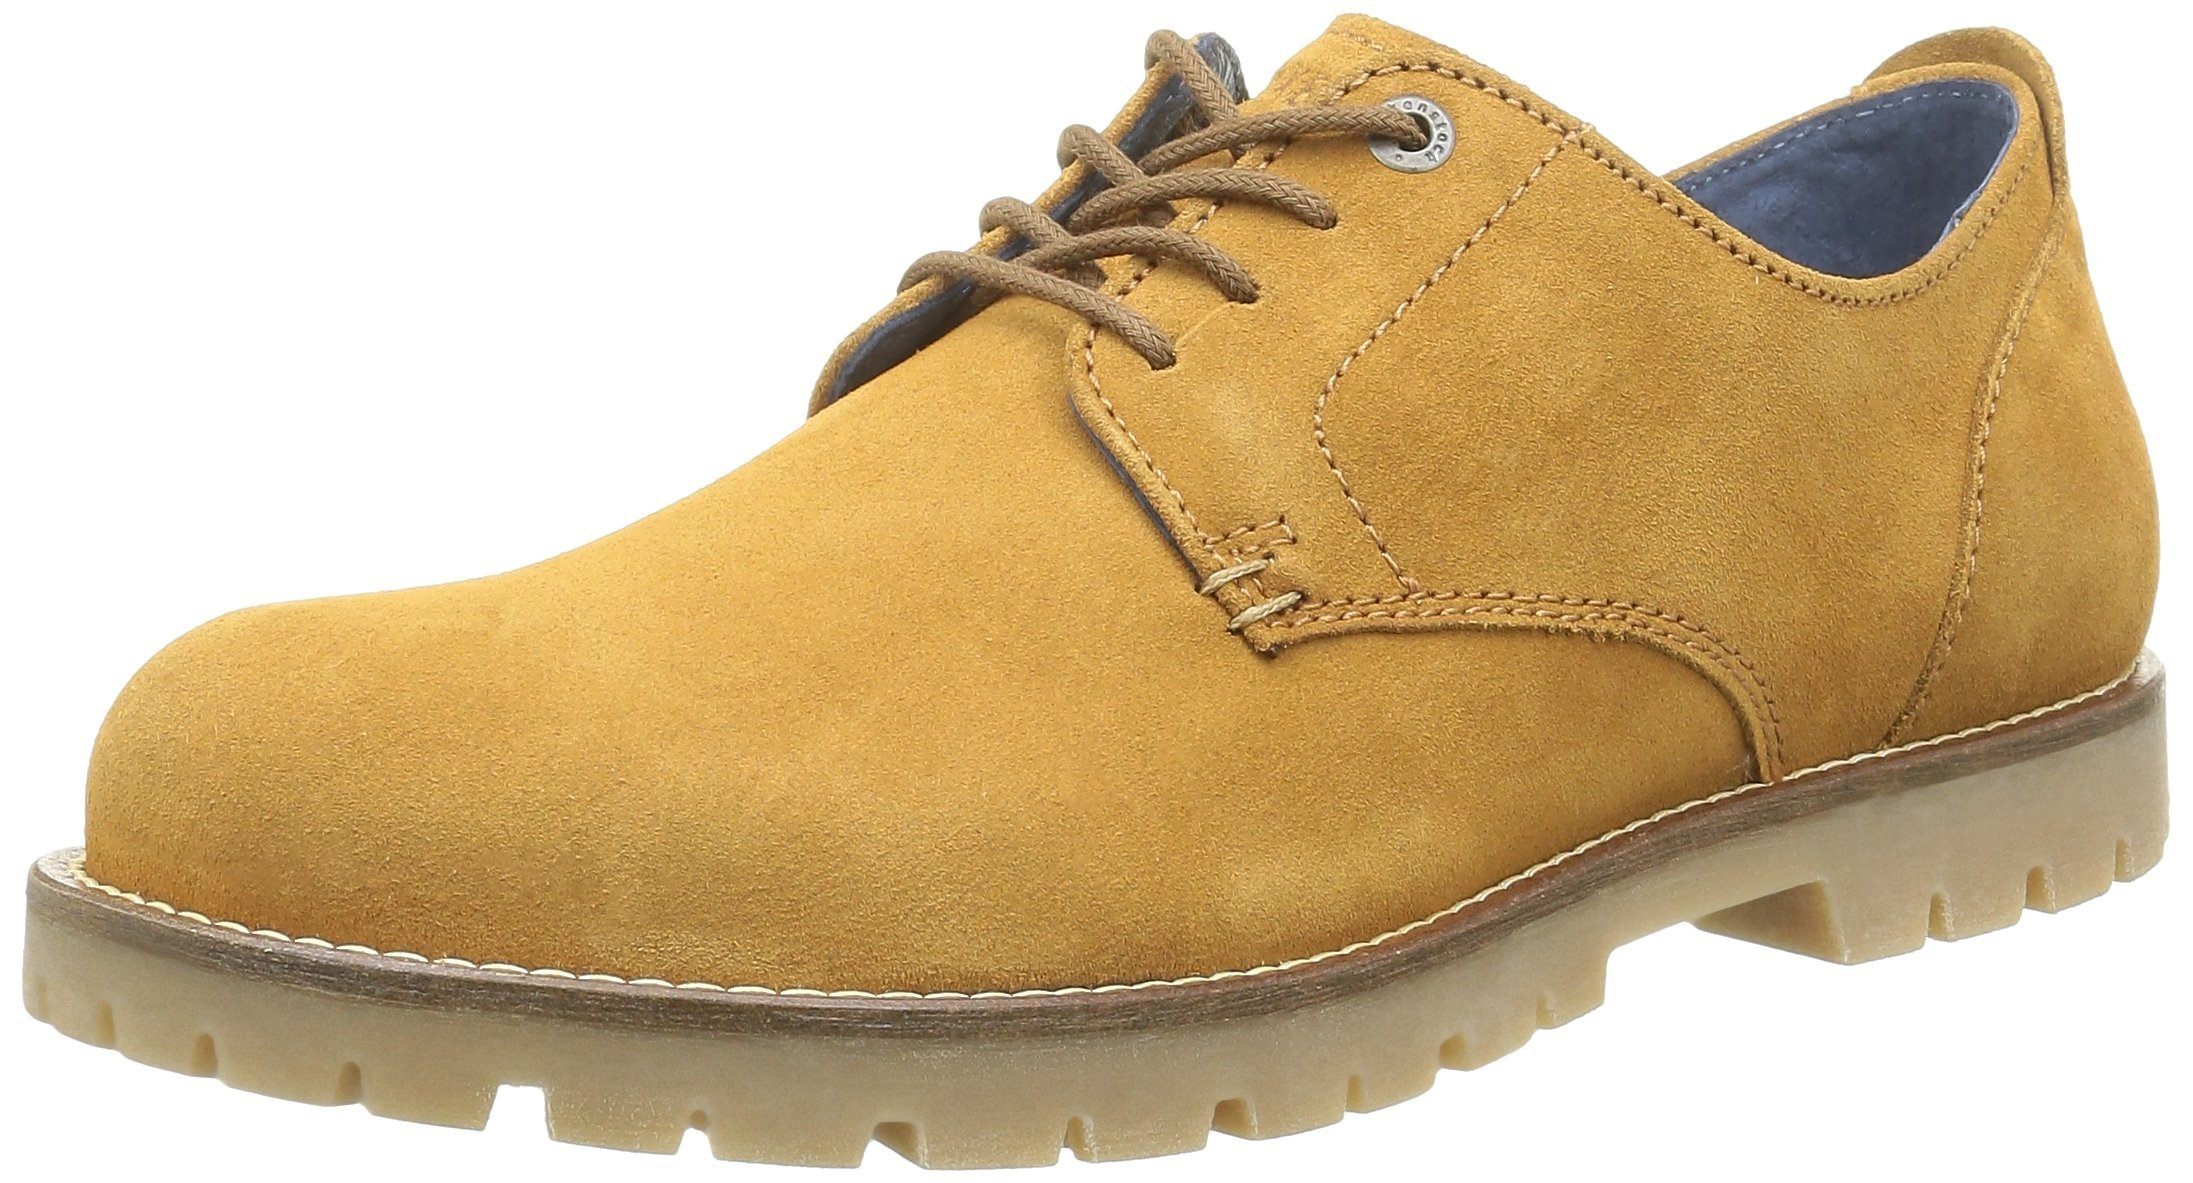 Lacées Birkenstock Gilford Eu Chaussures HommeMarronsahara45 IY6mbgf7yv